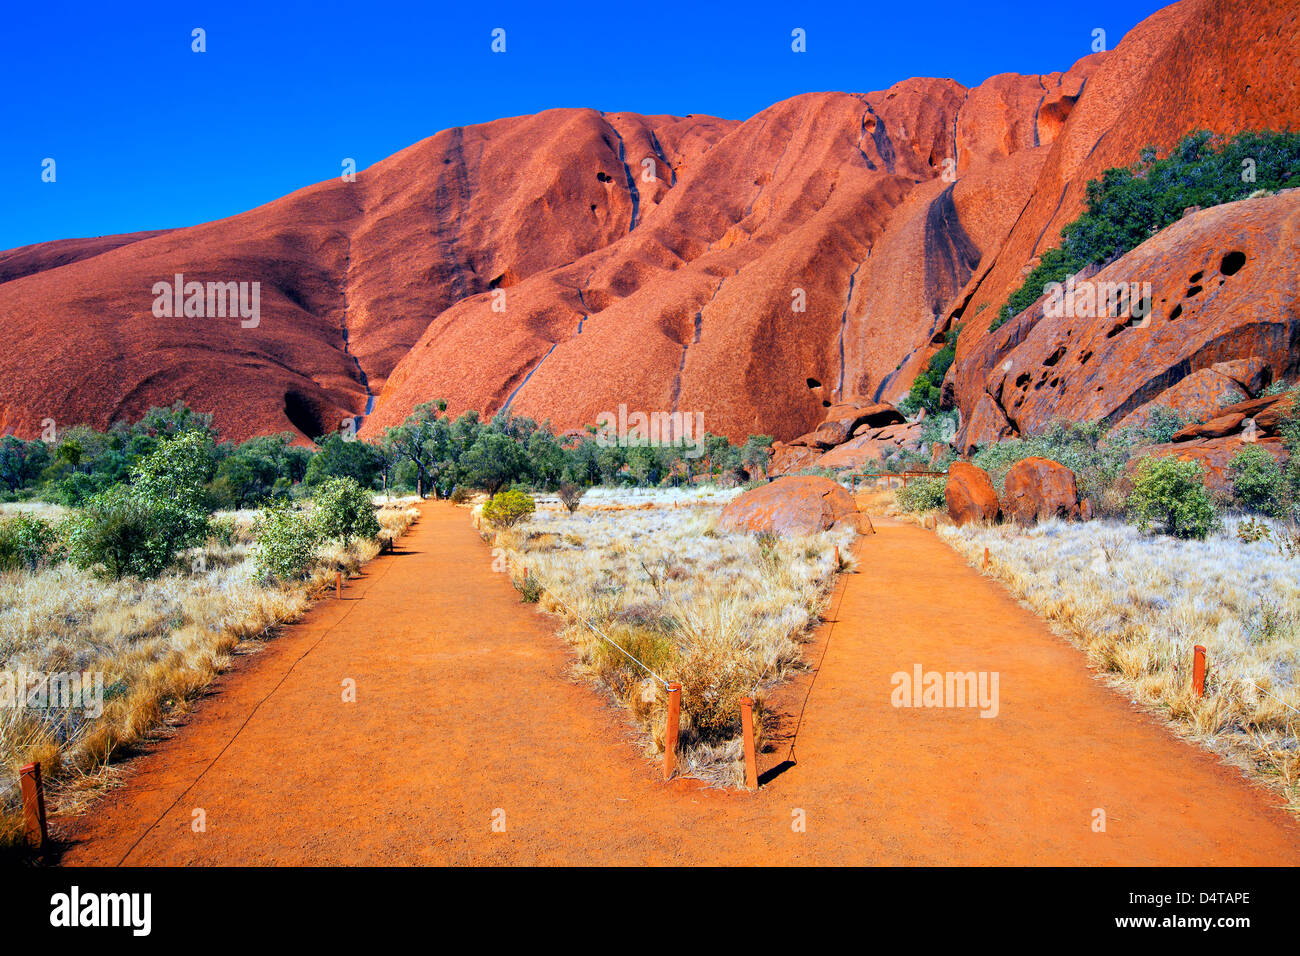 Outback-zentrale Australien Northern Territory Landschaft Landschaften outback Ayers Rock Uluru Stockbild